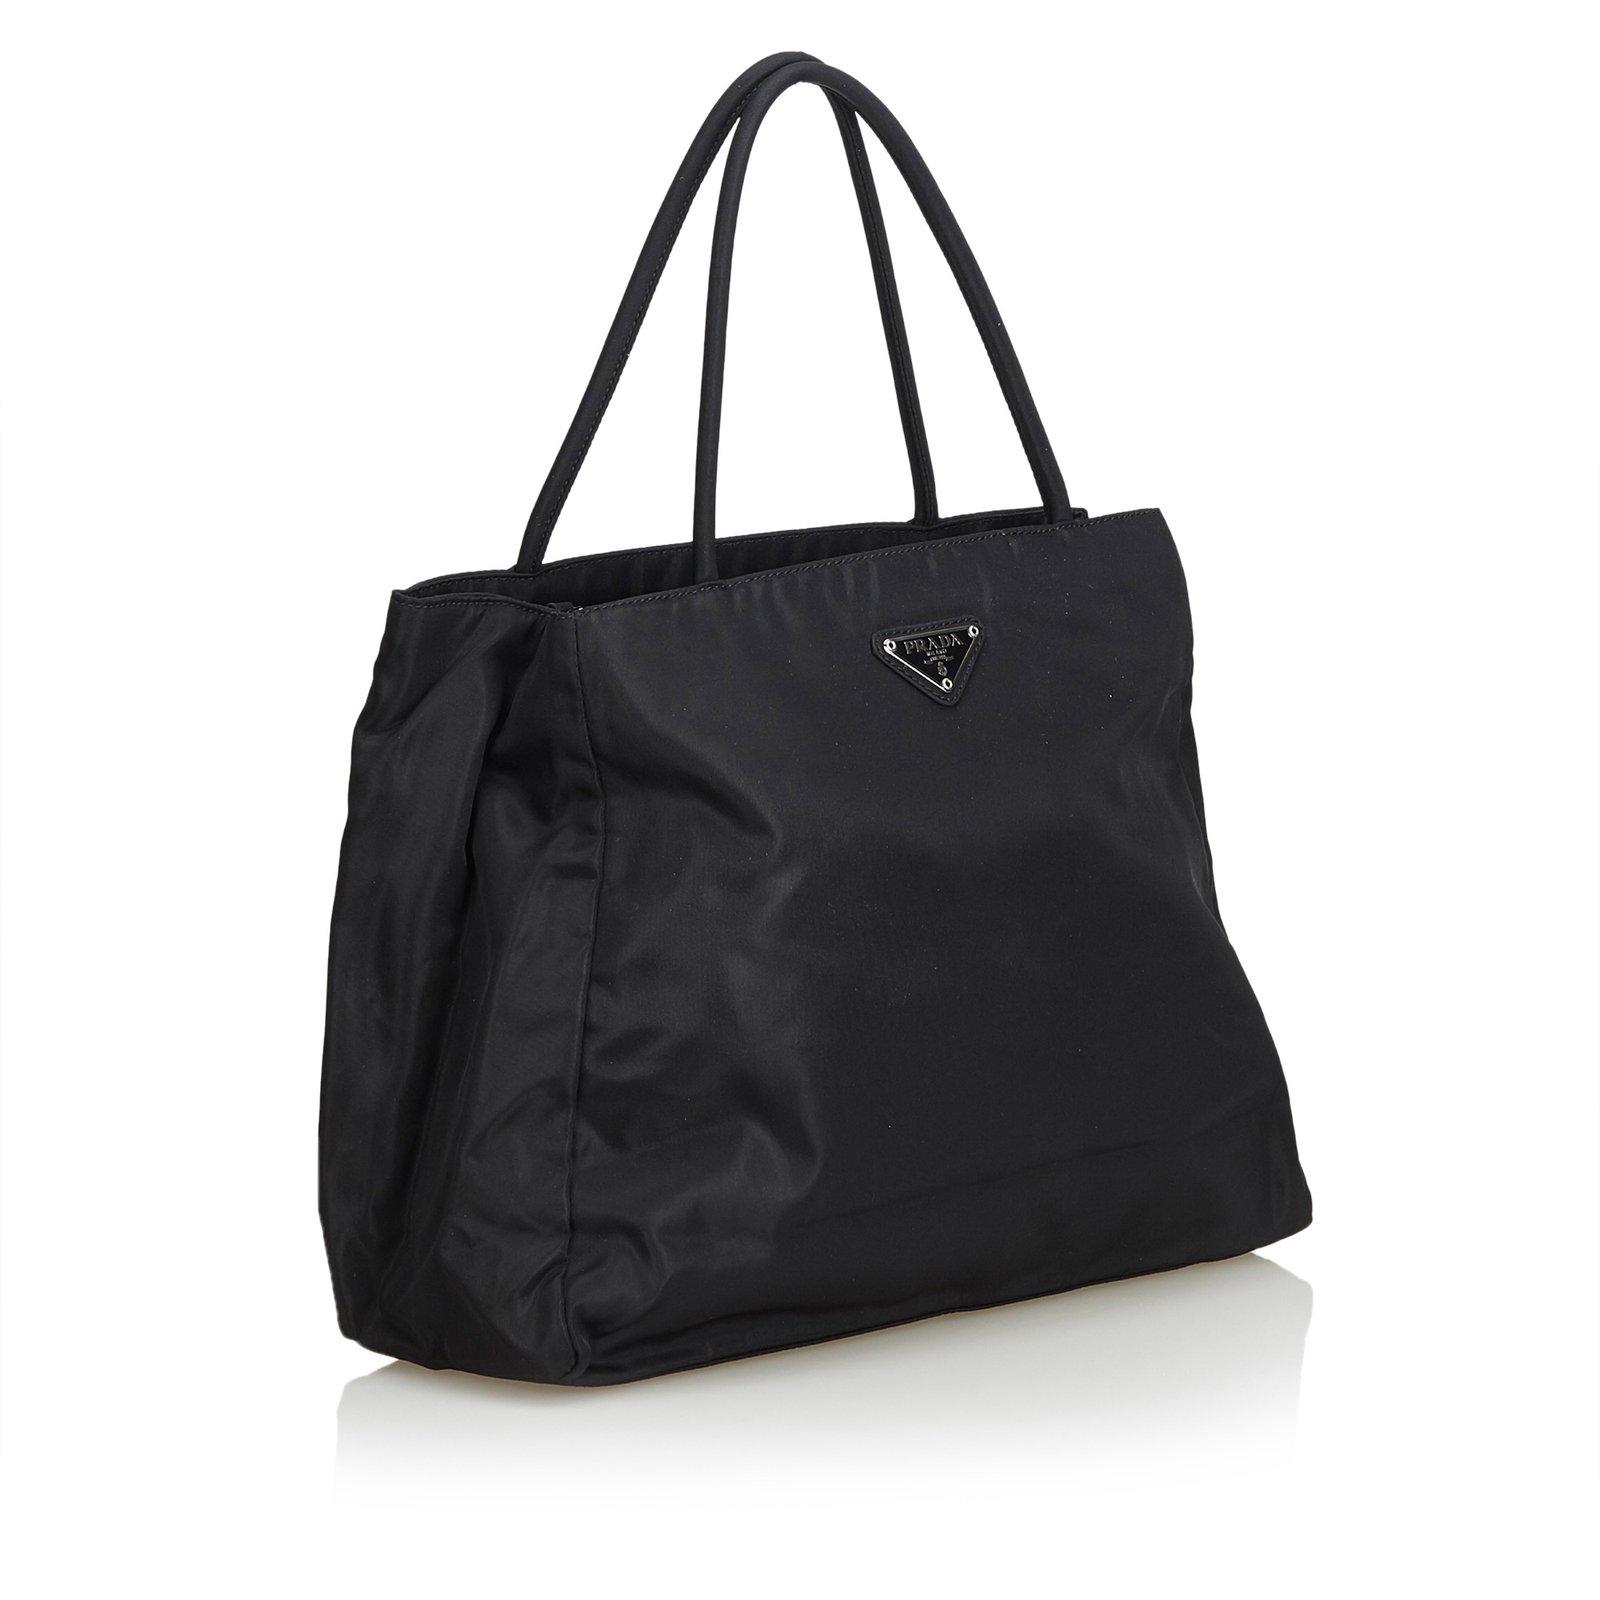 c1d4a8e738d5 Prada Nylon Tote Bag Totes Nylon,Cloth Black ref.103081 - Joli Closet